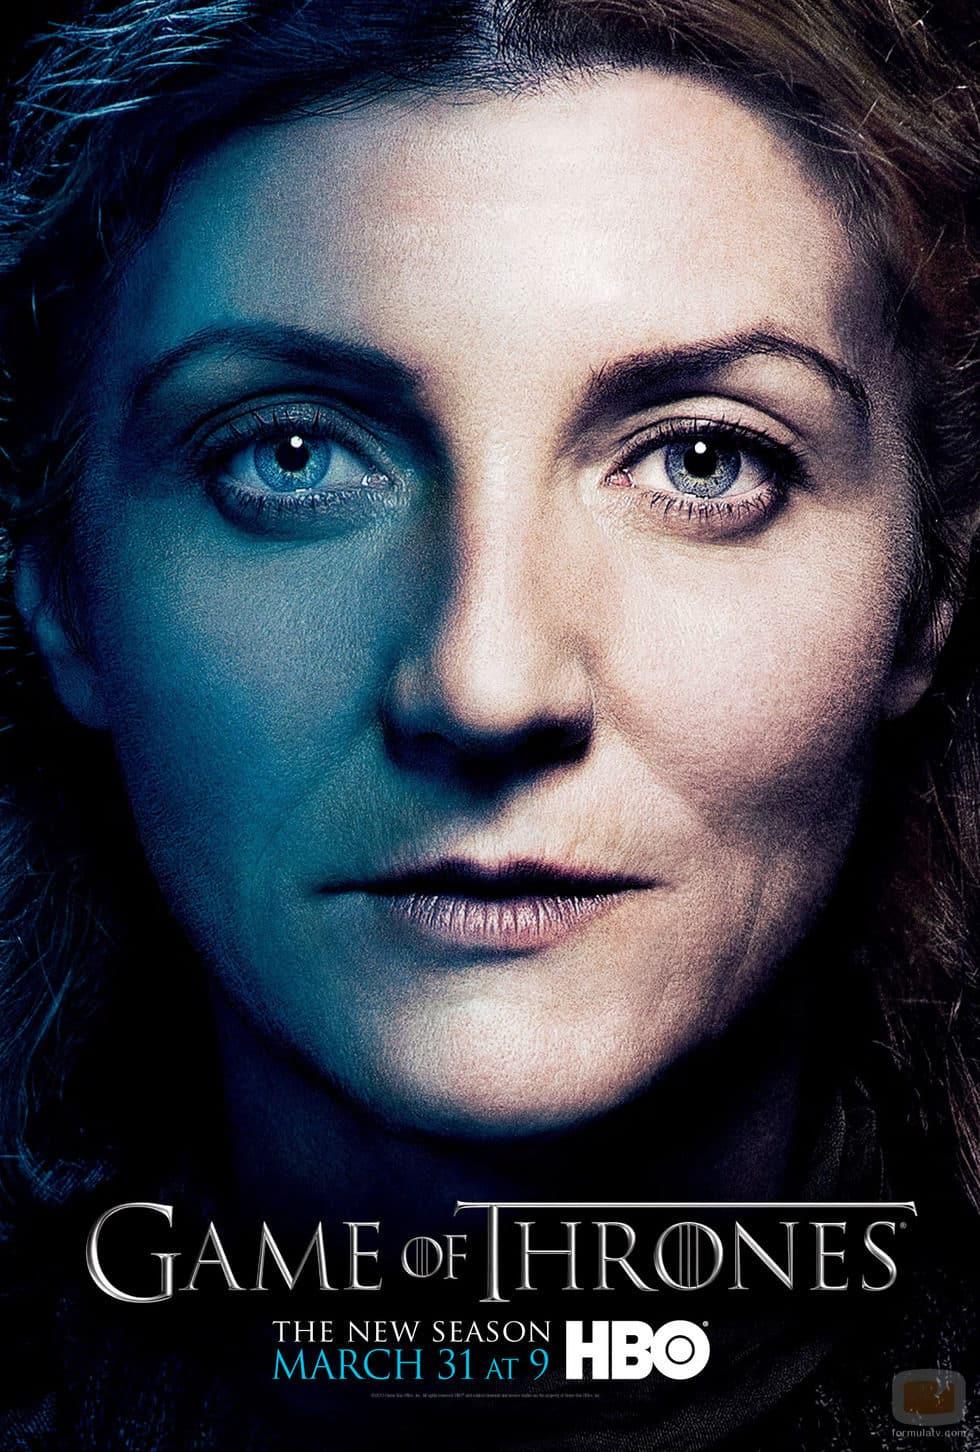 catelyn-stark-poster-promocional-tercera-temporada-juego-de-tronos